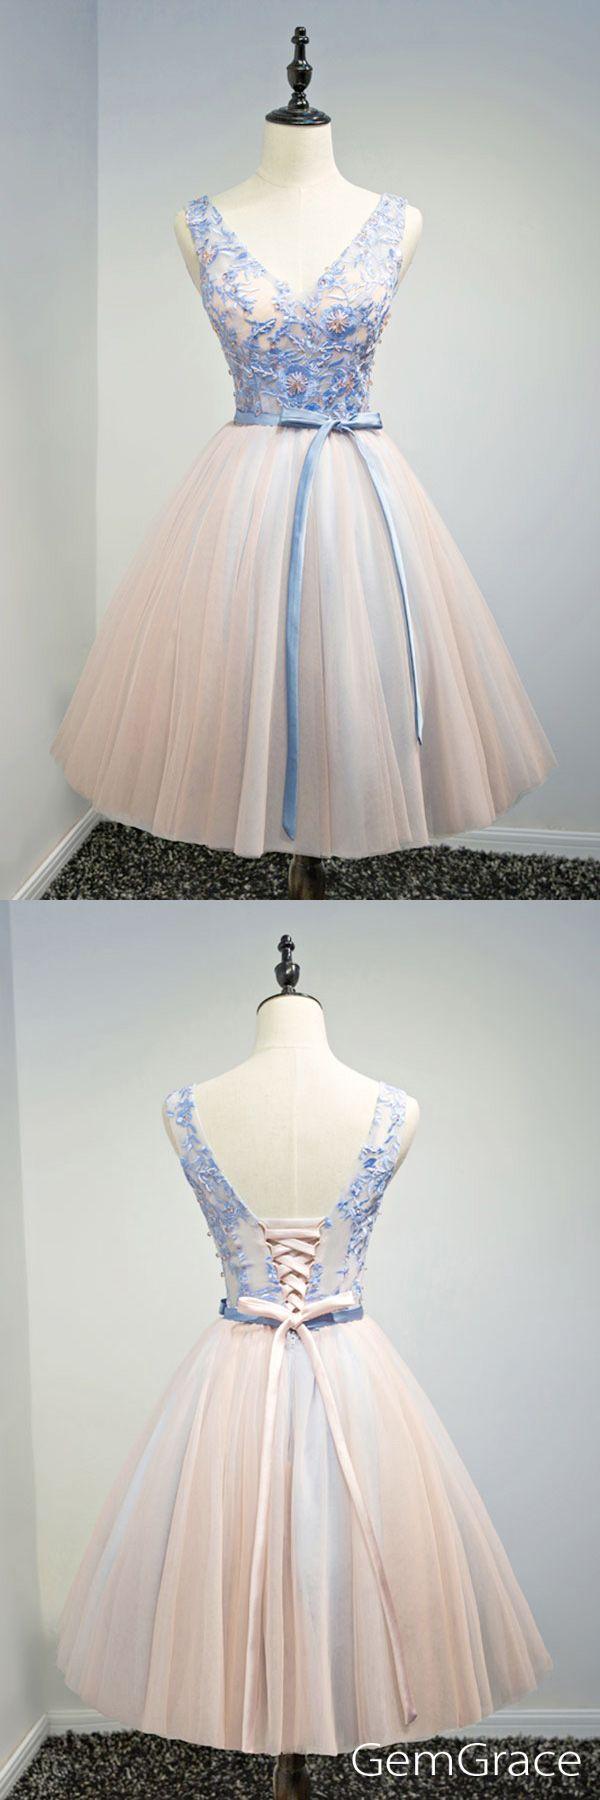 V-neck short tulle prom party dress